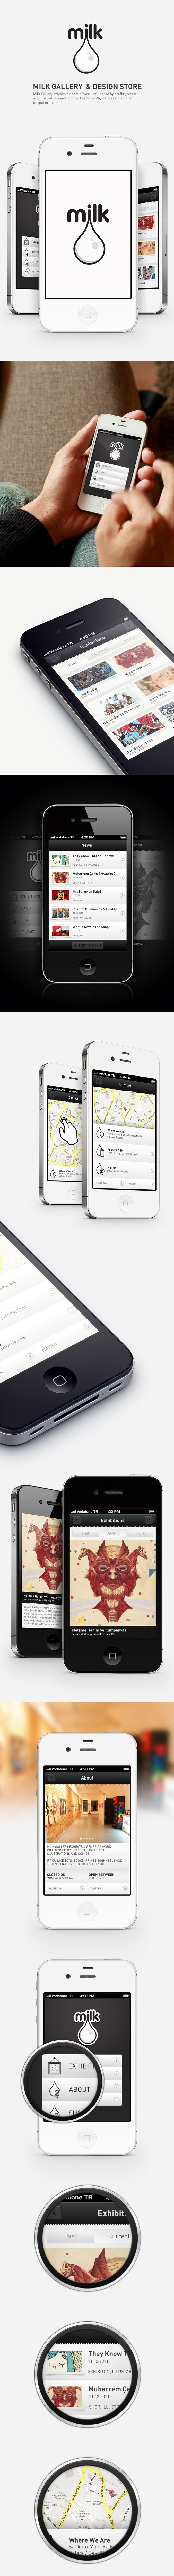 Milk Gallery - iPhone App / Gokhun Guneyhan #iphone #design #guidesign #inspiration #ui